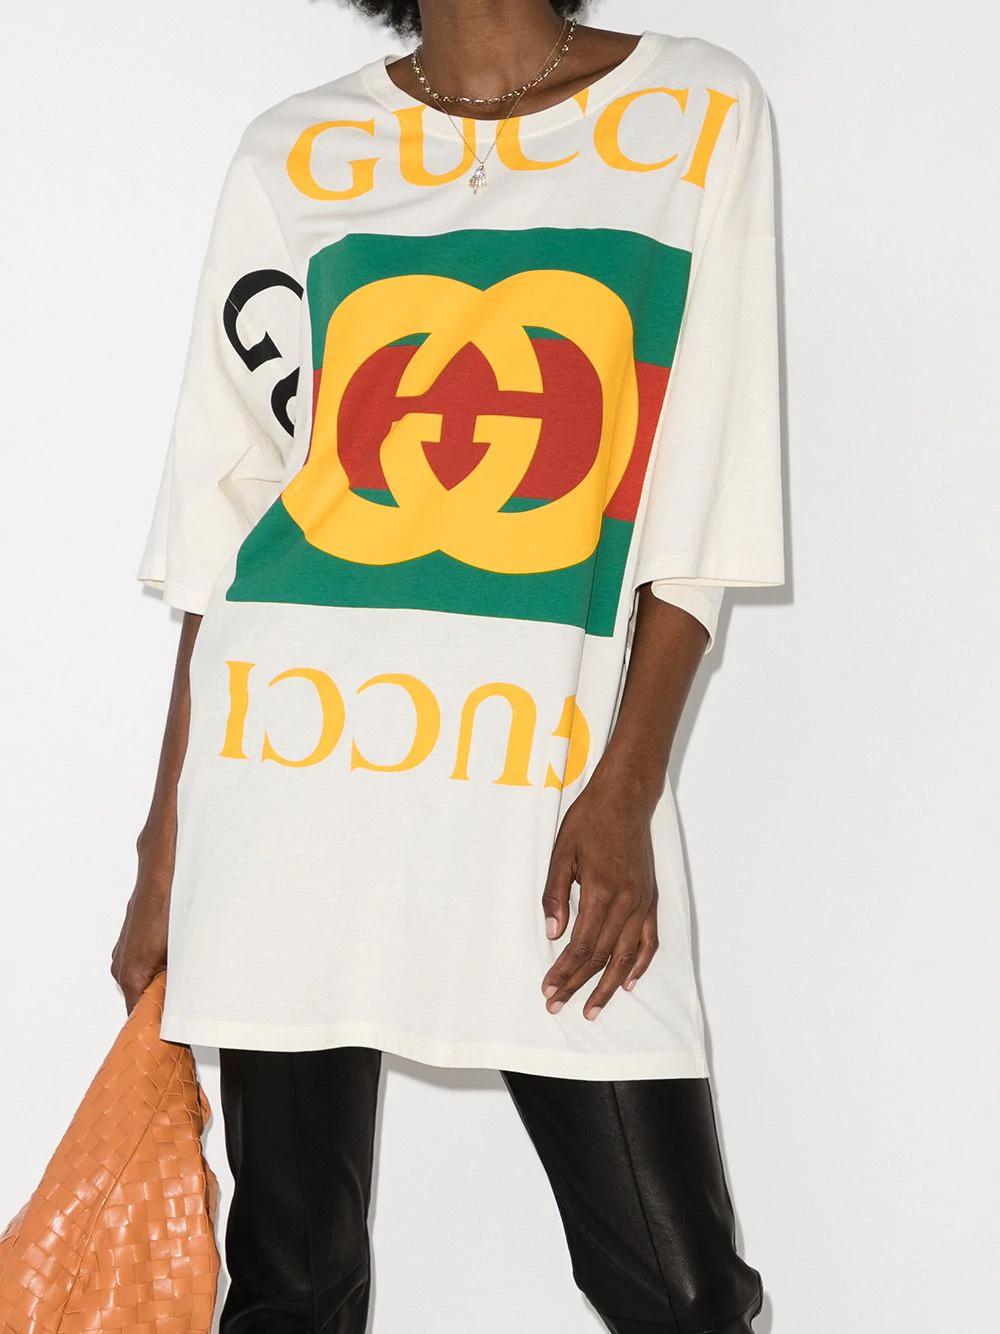 Gucci GG Oversized T-shirt - Farfetch   Oversized tshirt, Gucci t ...